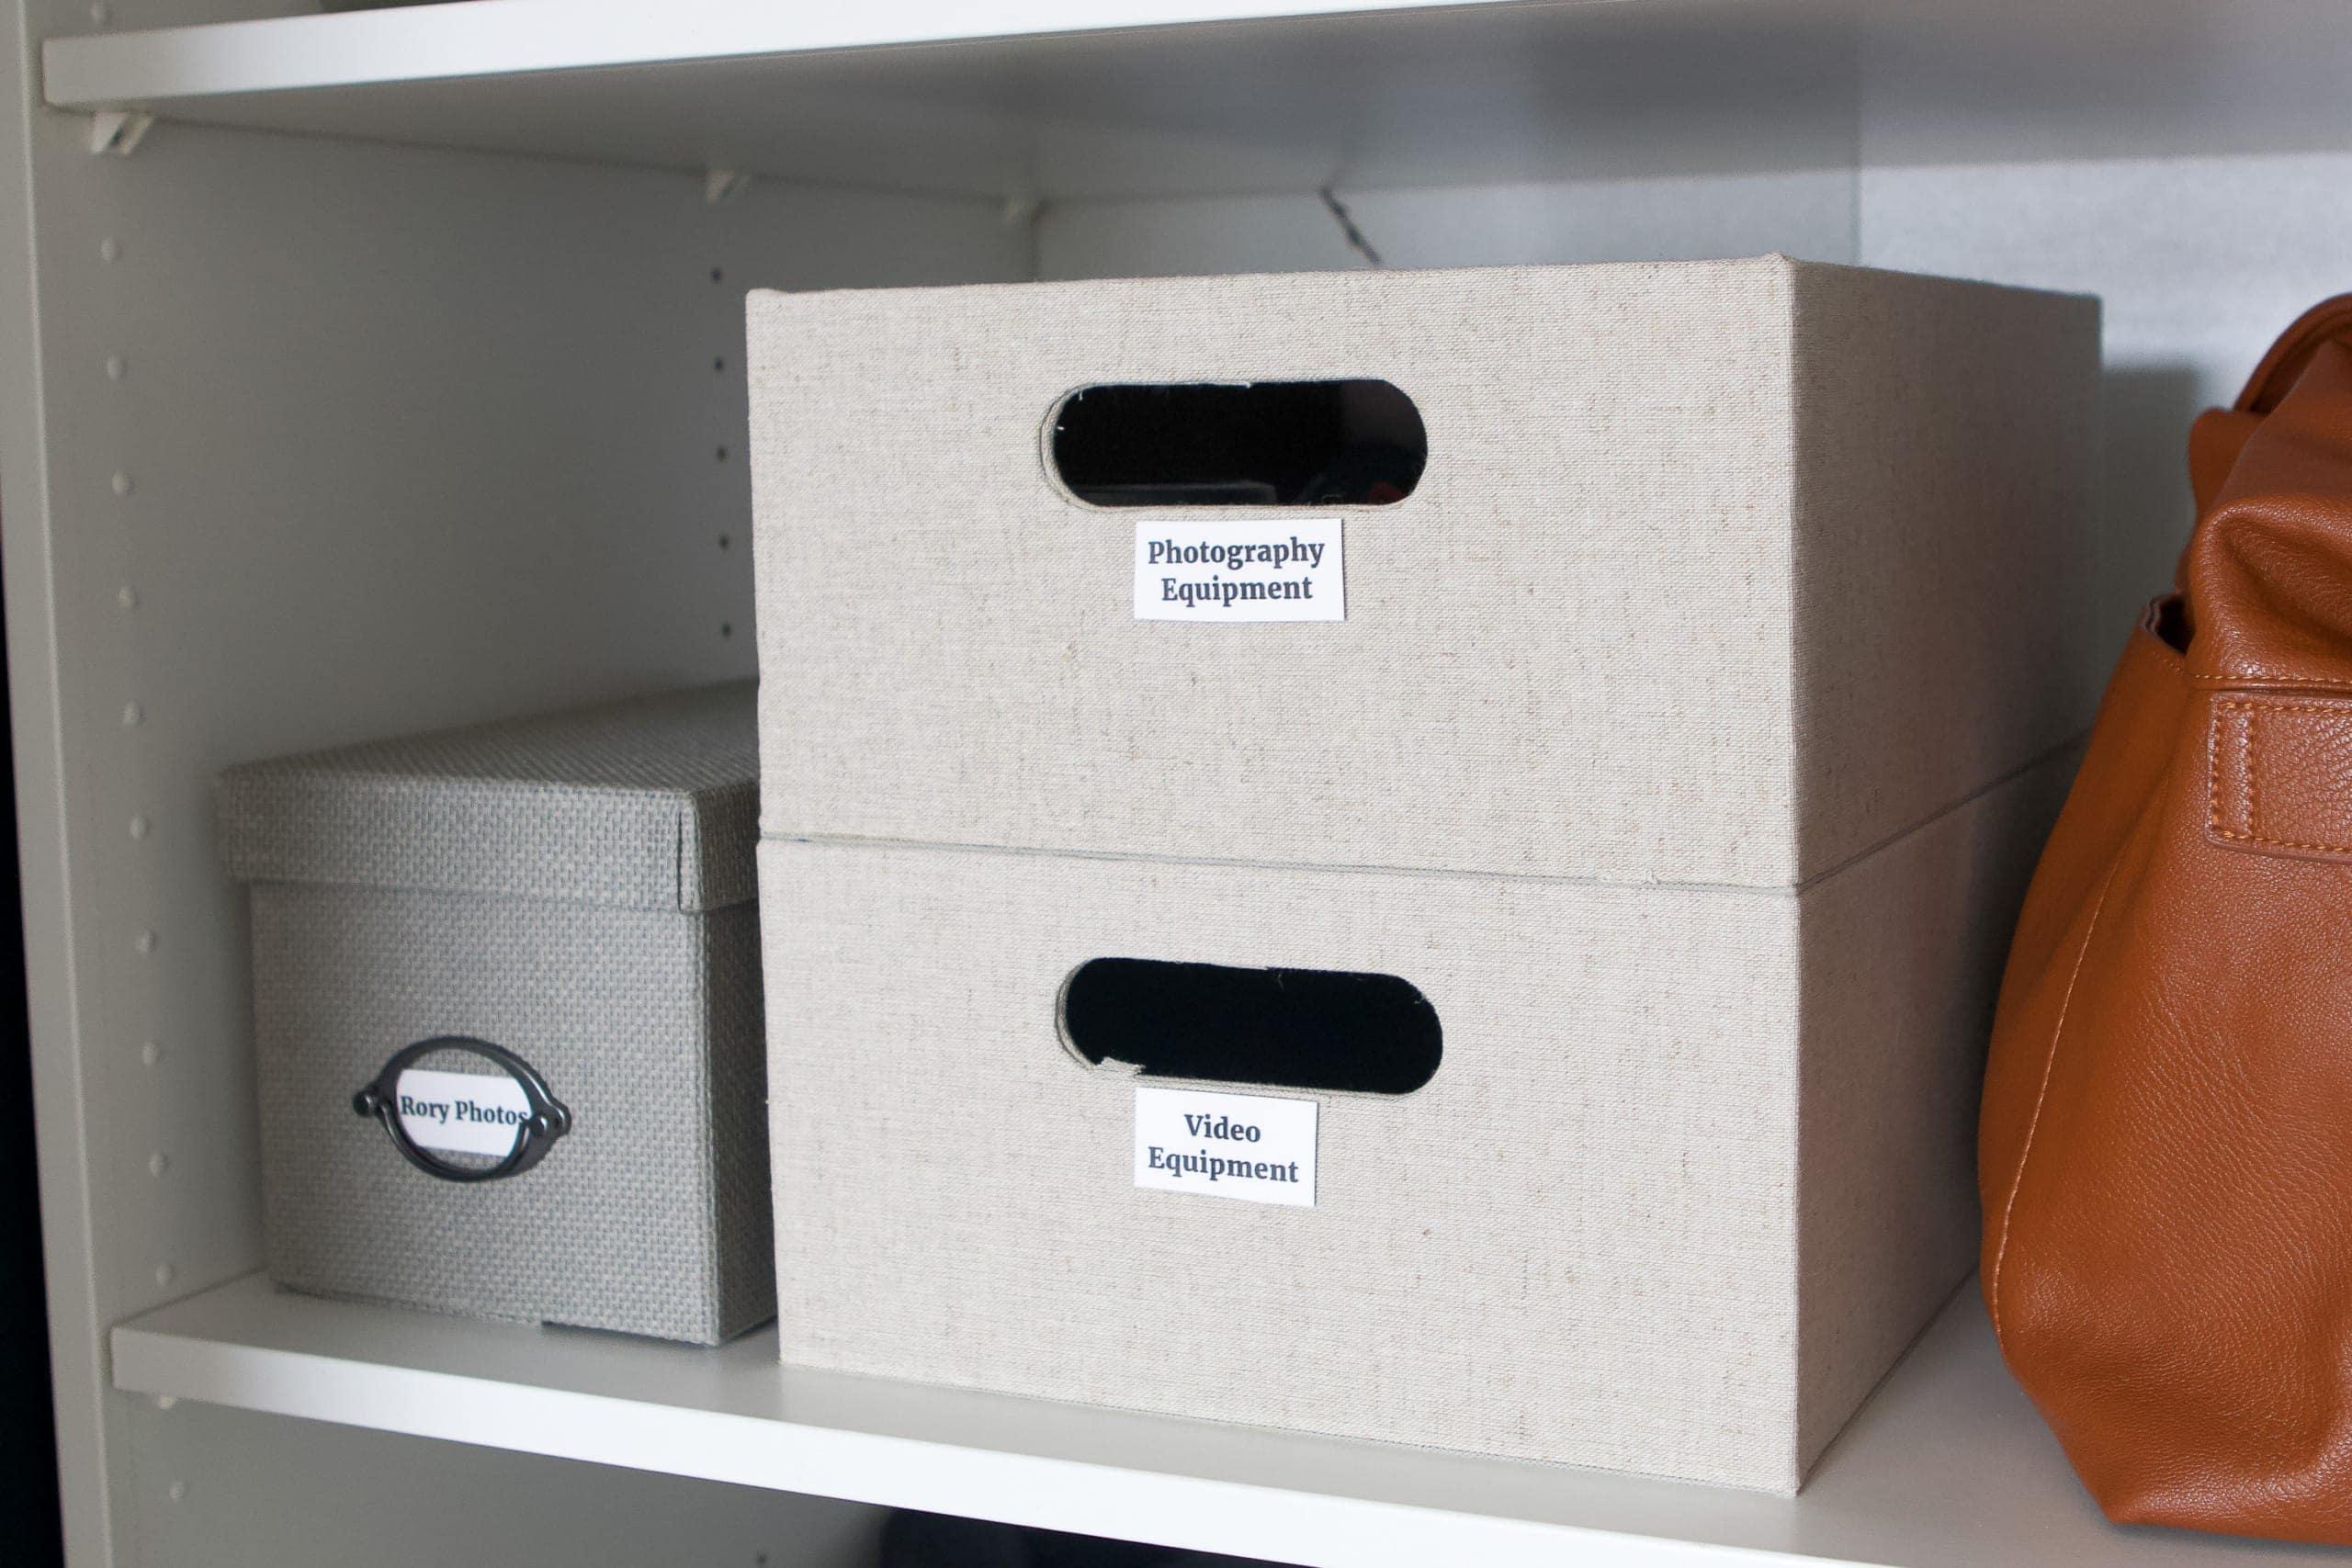 Adding more storage bins